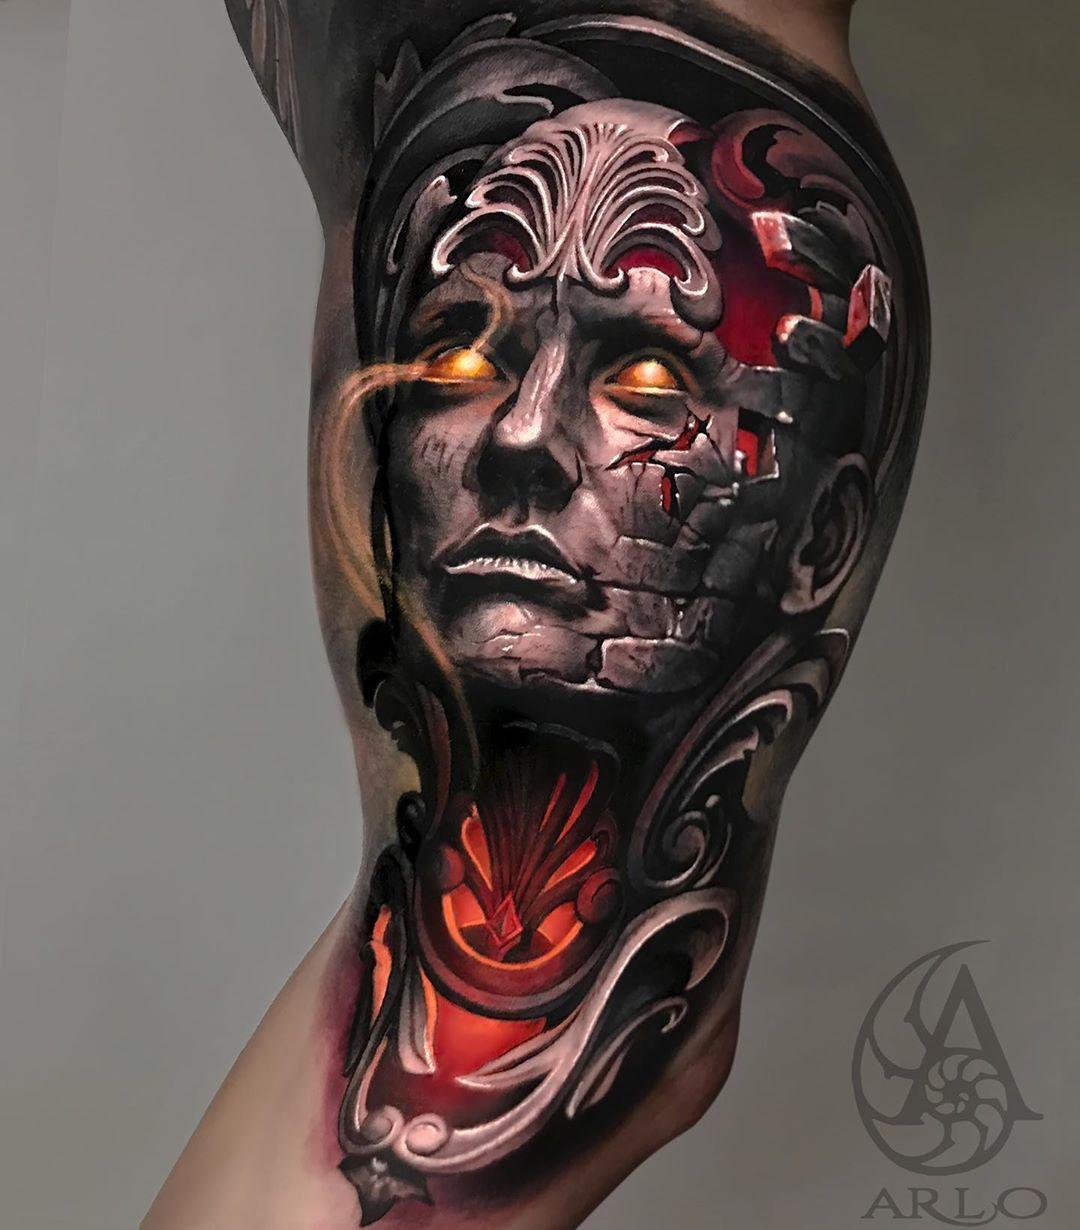 Сюрреалистические 3D-татуировки от Арло ДиКристина